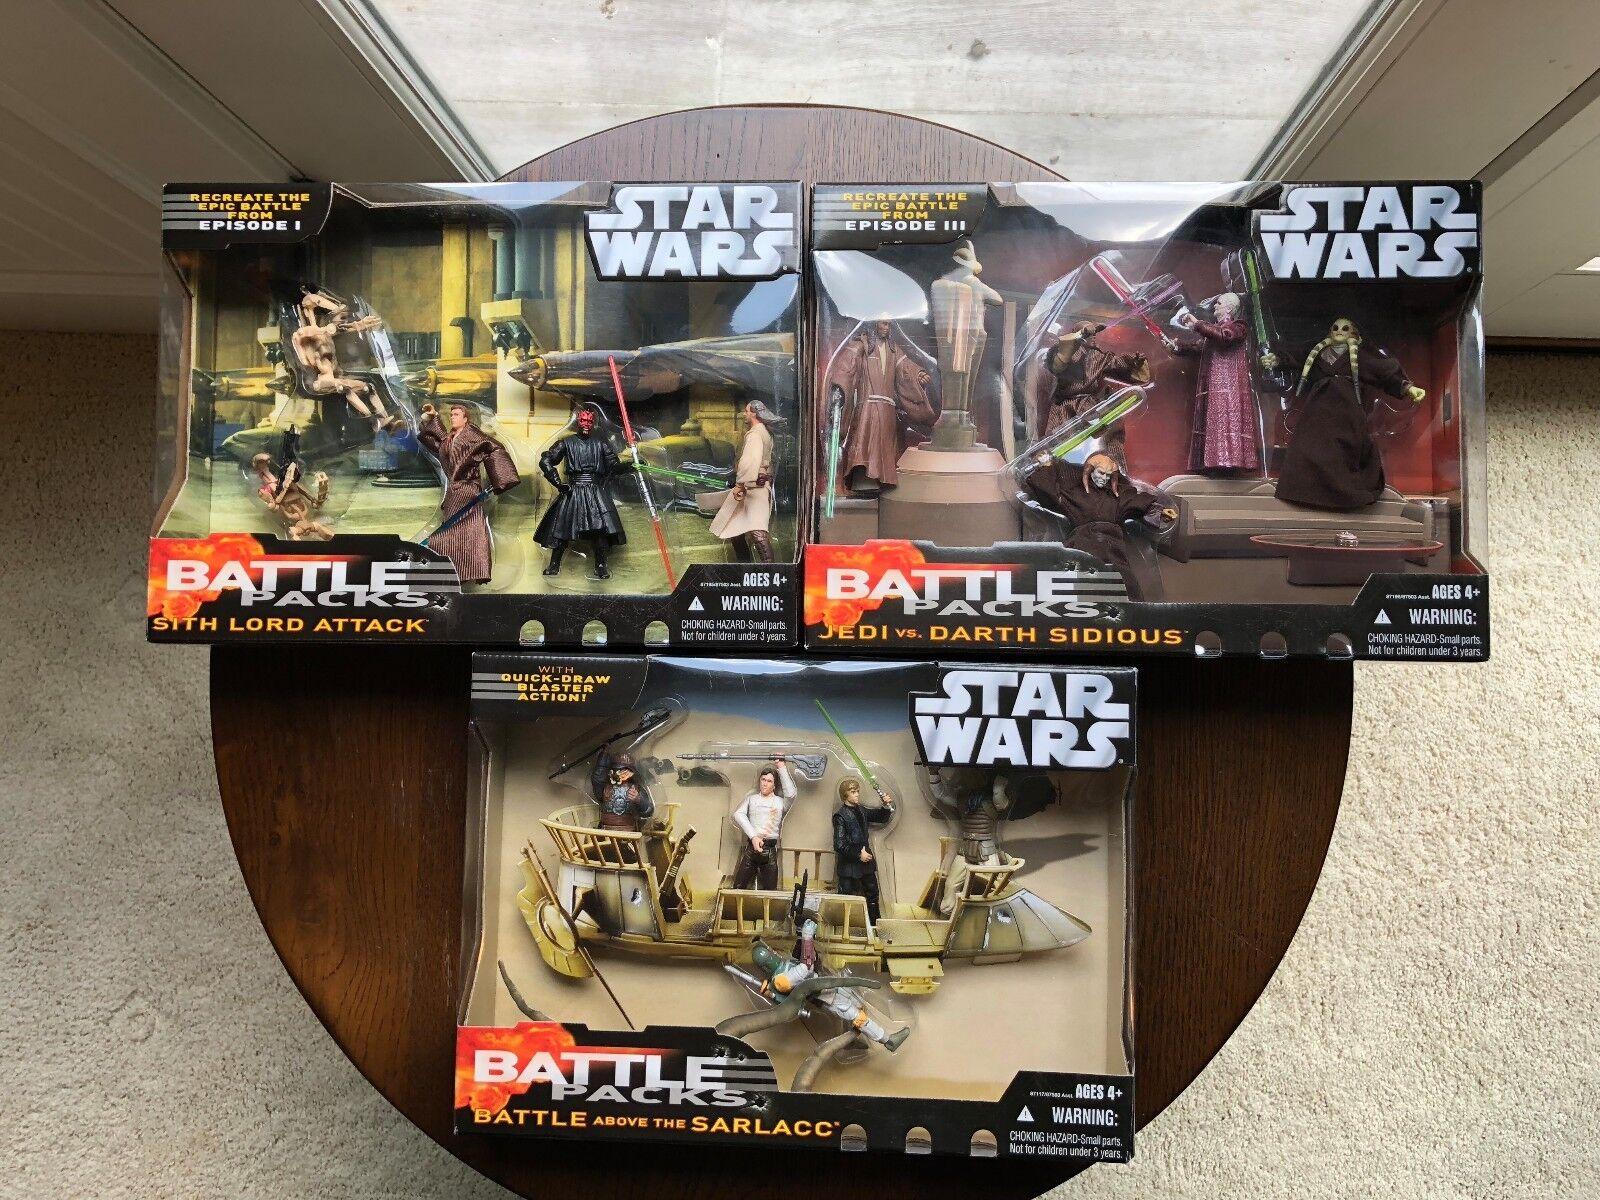 Hasbro Stern Wars kämpfen Verpackungs Complete Set of 3